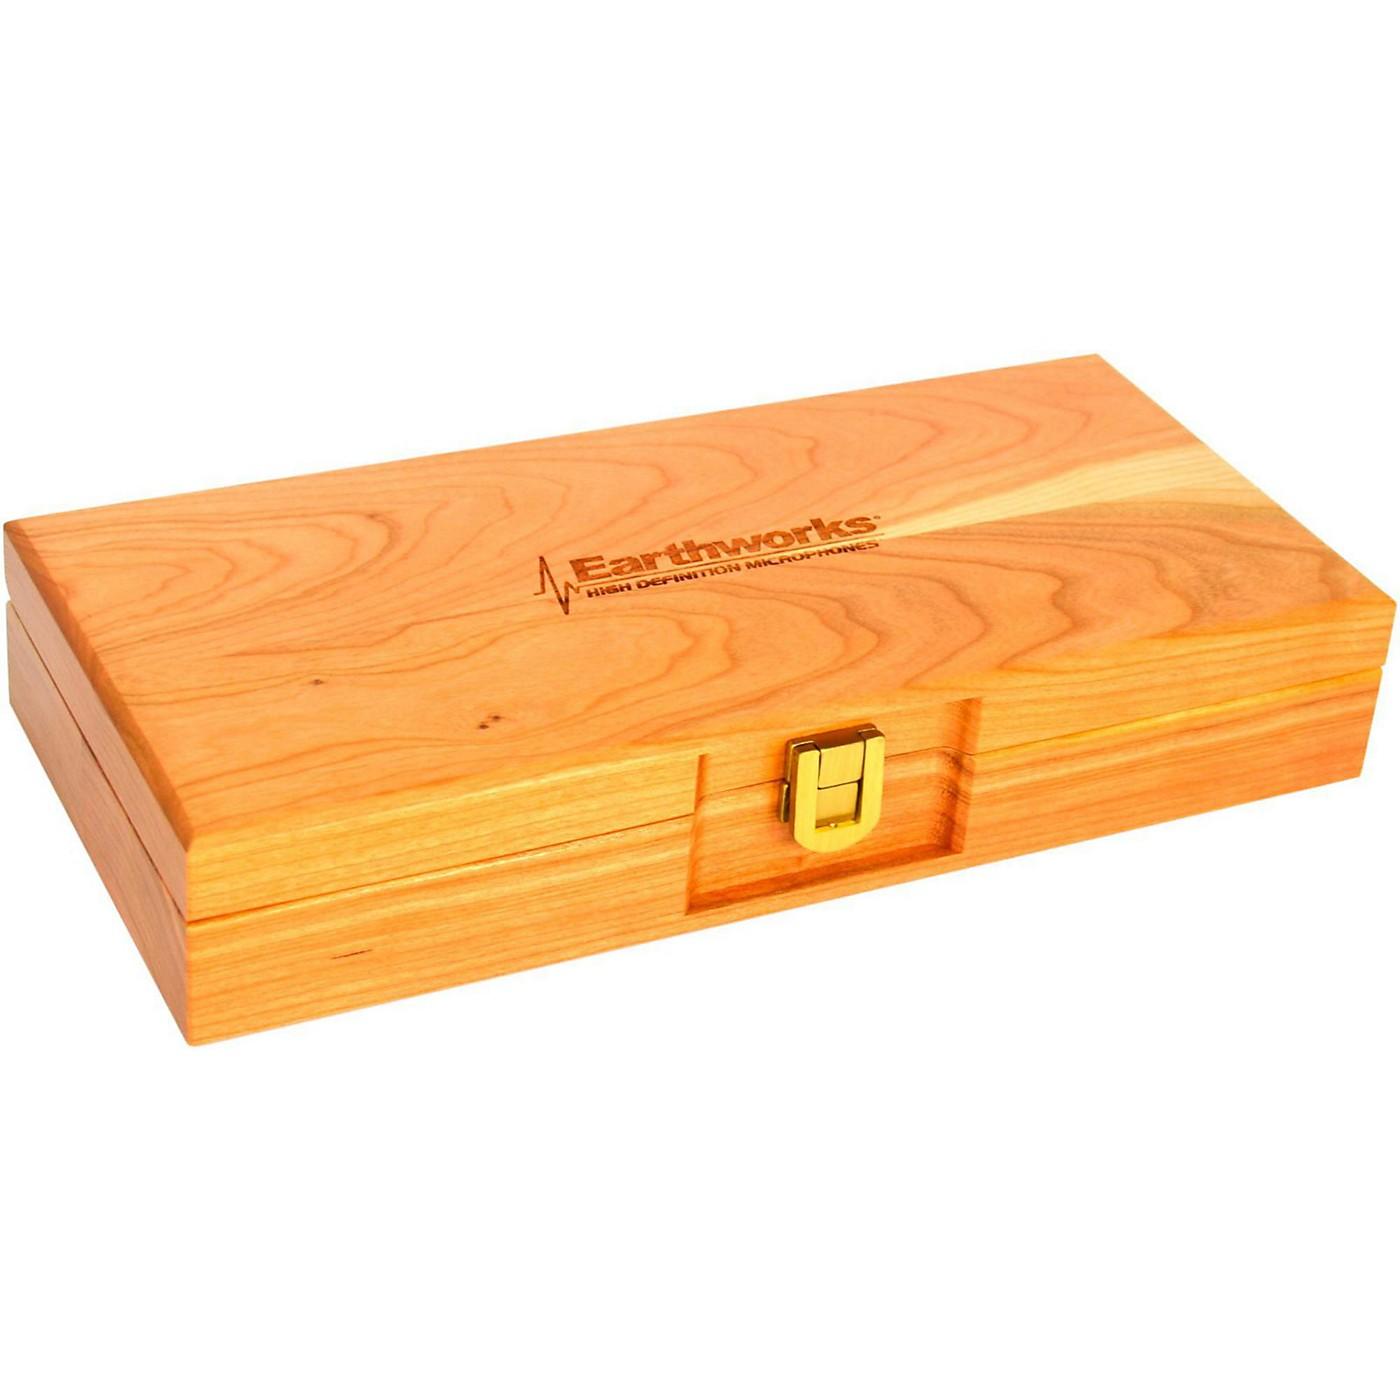 Earthworks ECB1 Cherry Wood Mic Box thumbnail